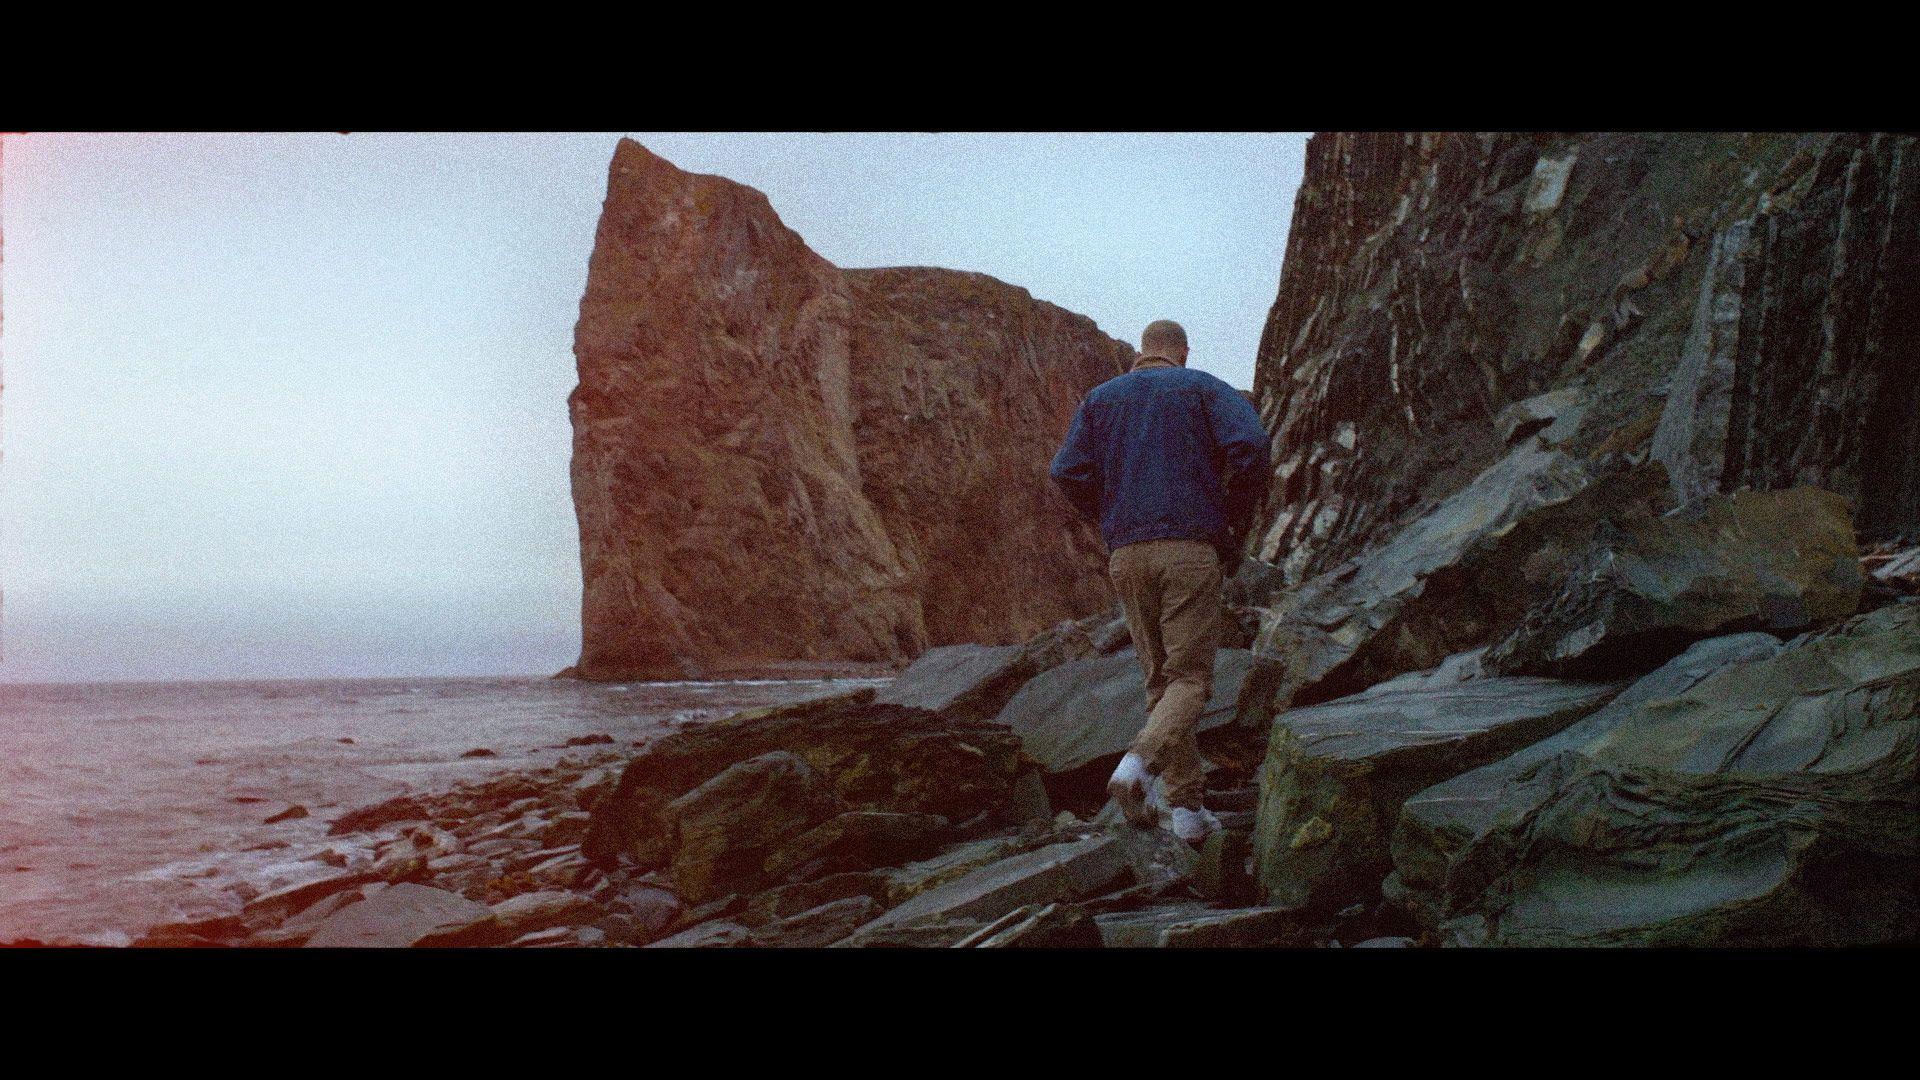 singer Yuki Dreams Again walking on rocks on the seaside wearing dark blue coat and camel pants in their promotional video filmed by Les Gamins